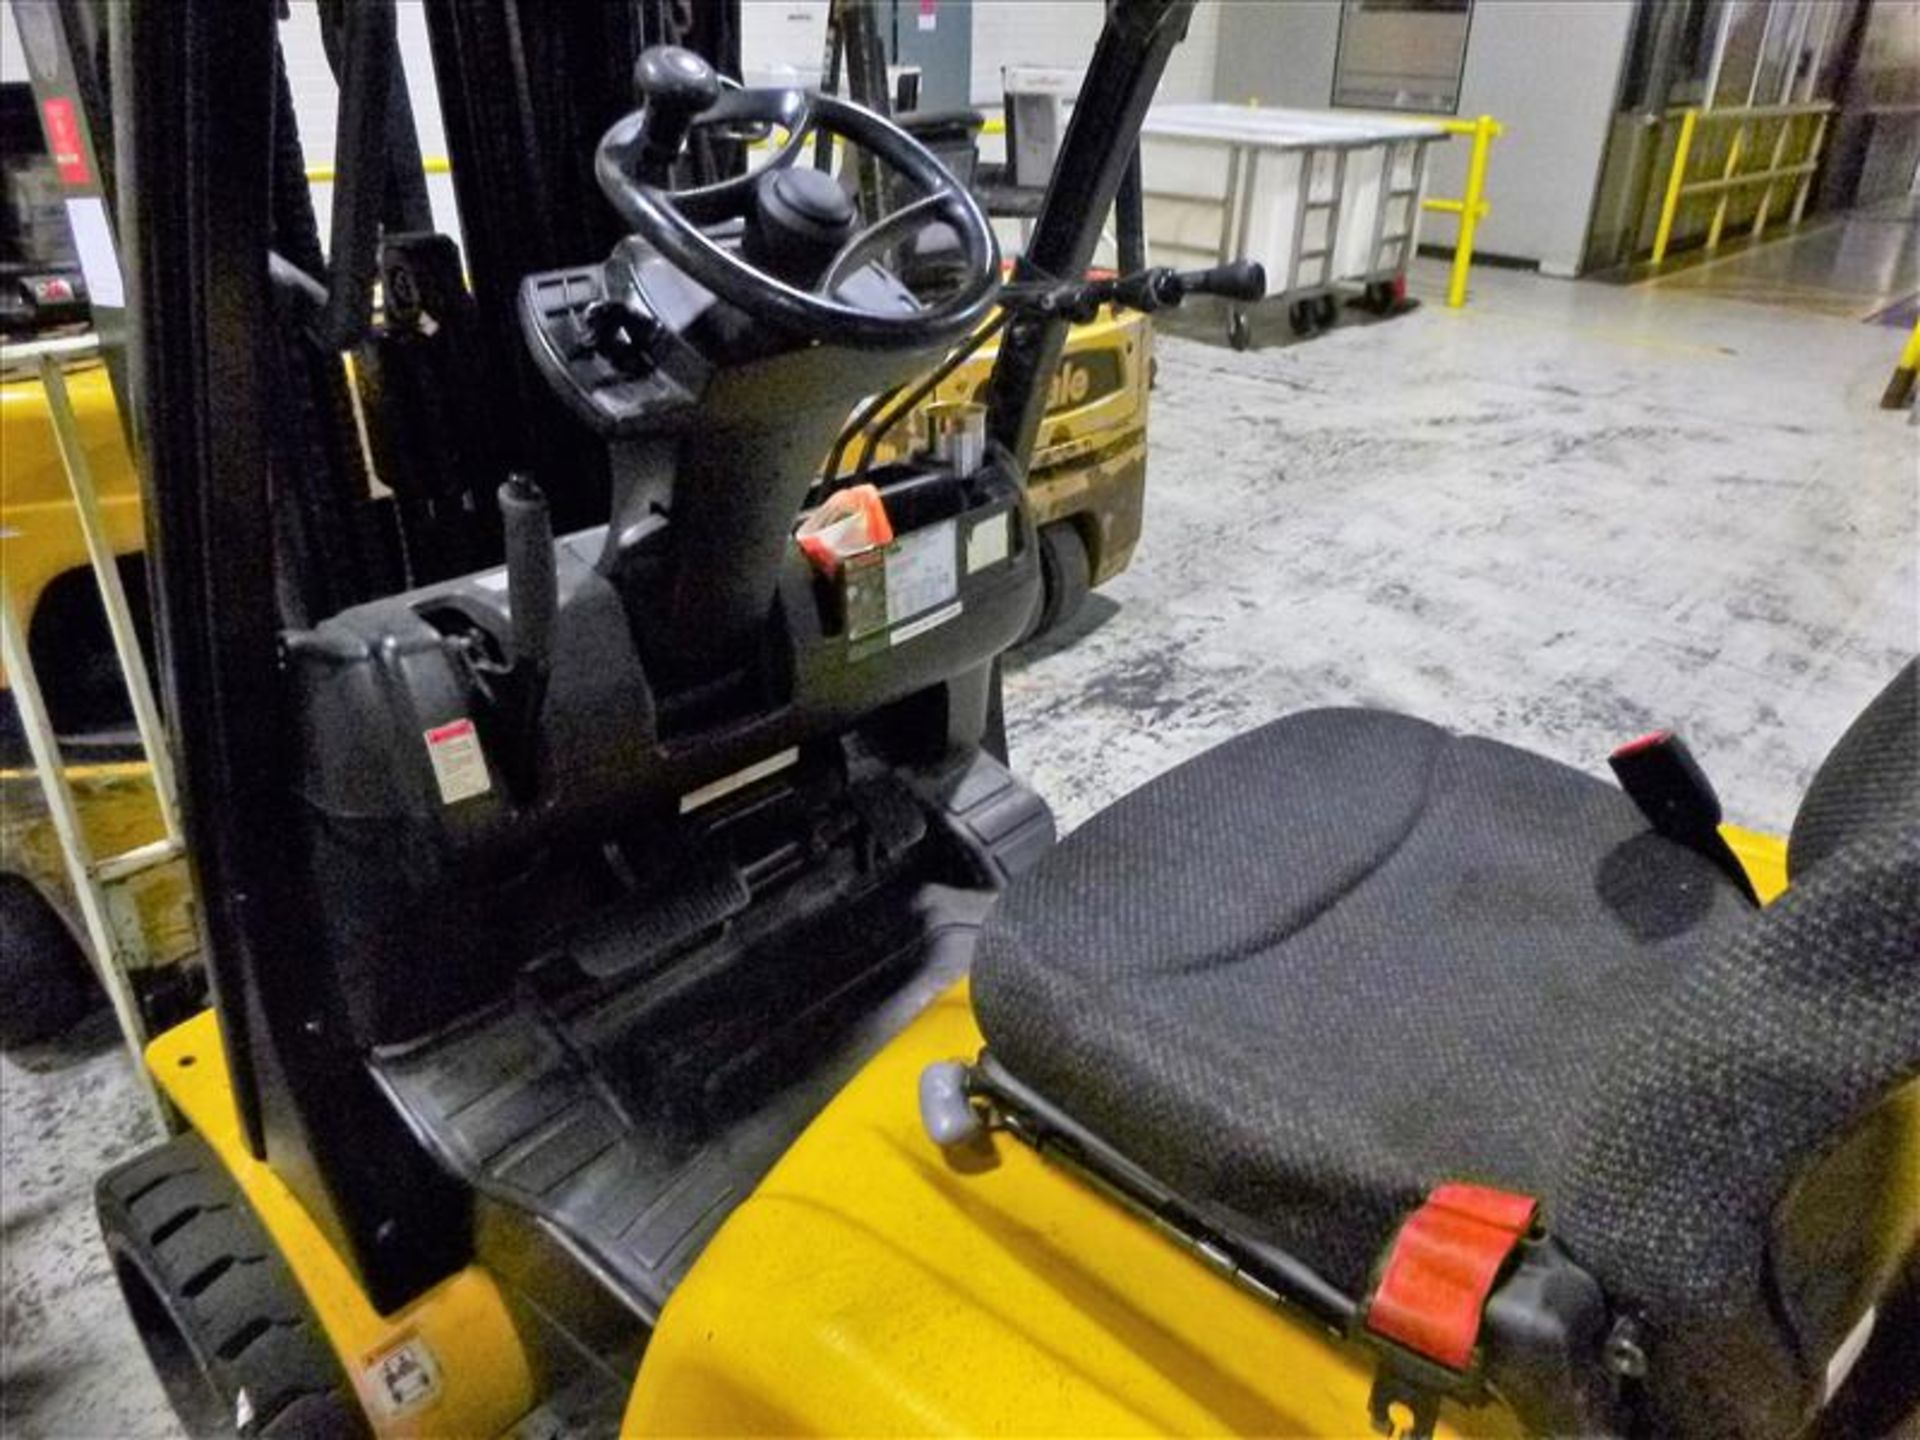 Yale fork lift truck, mod. GLC060VXNVSQ084, ser. no. A91V15562G, LPG, 4000 lbs cap., 240 in. lift - Image 3 of 4